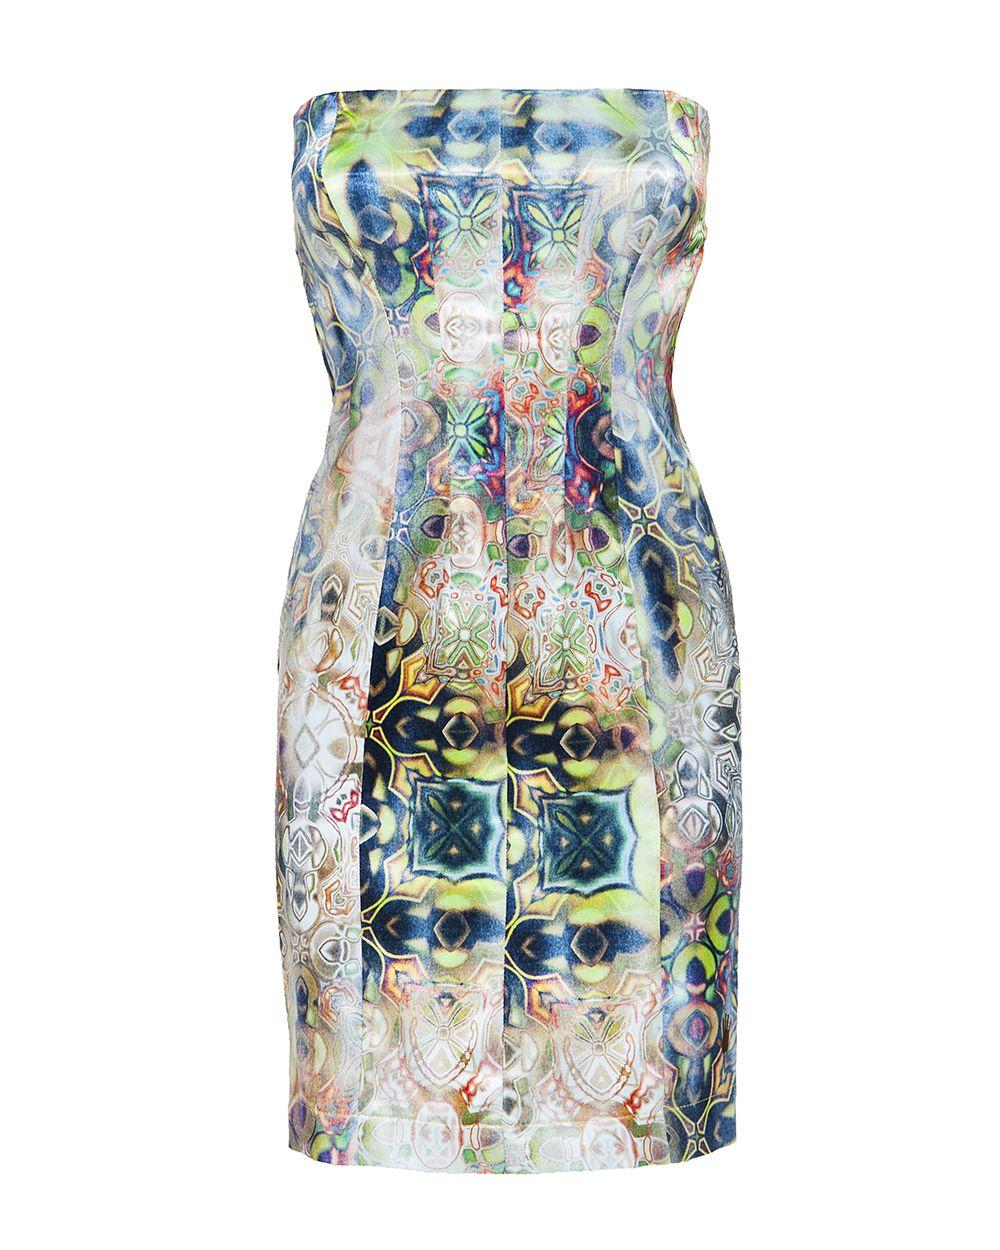 Strapless Day Dress